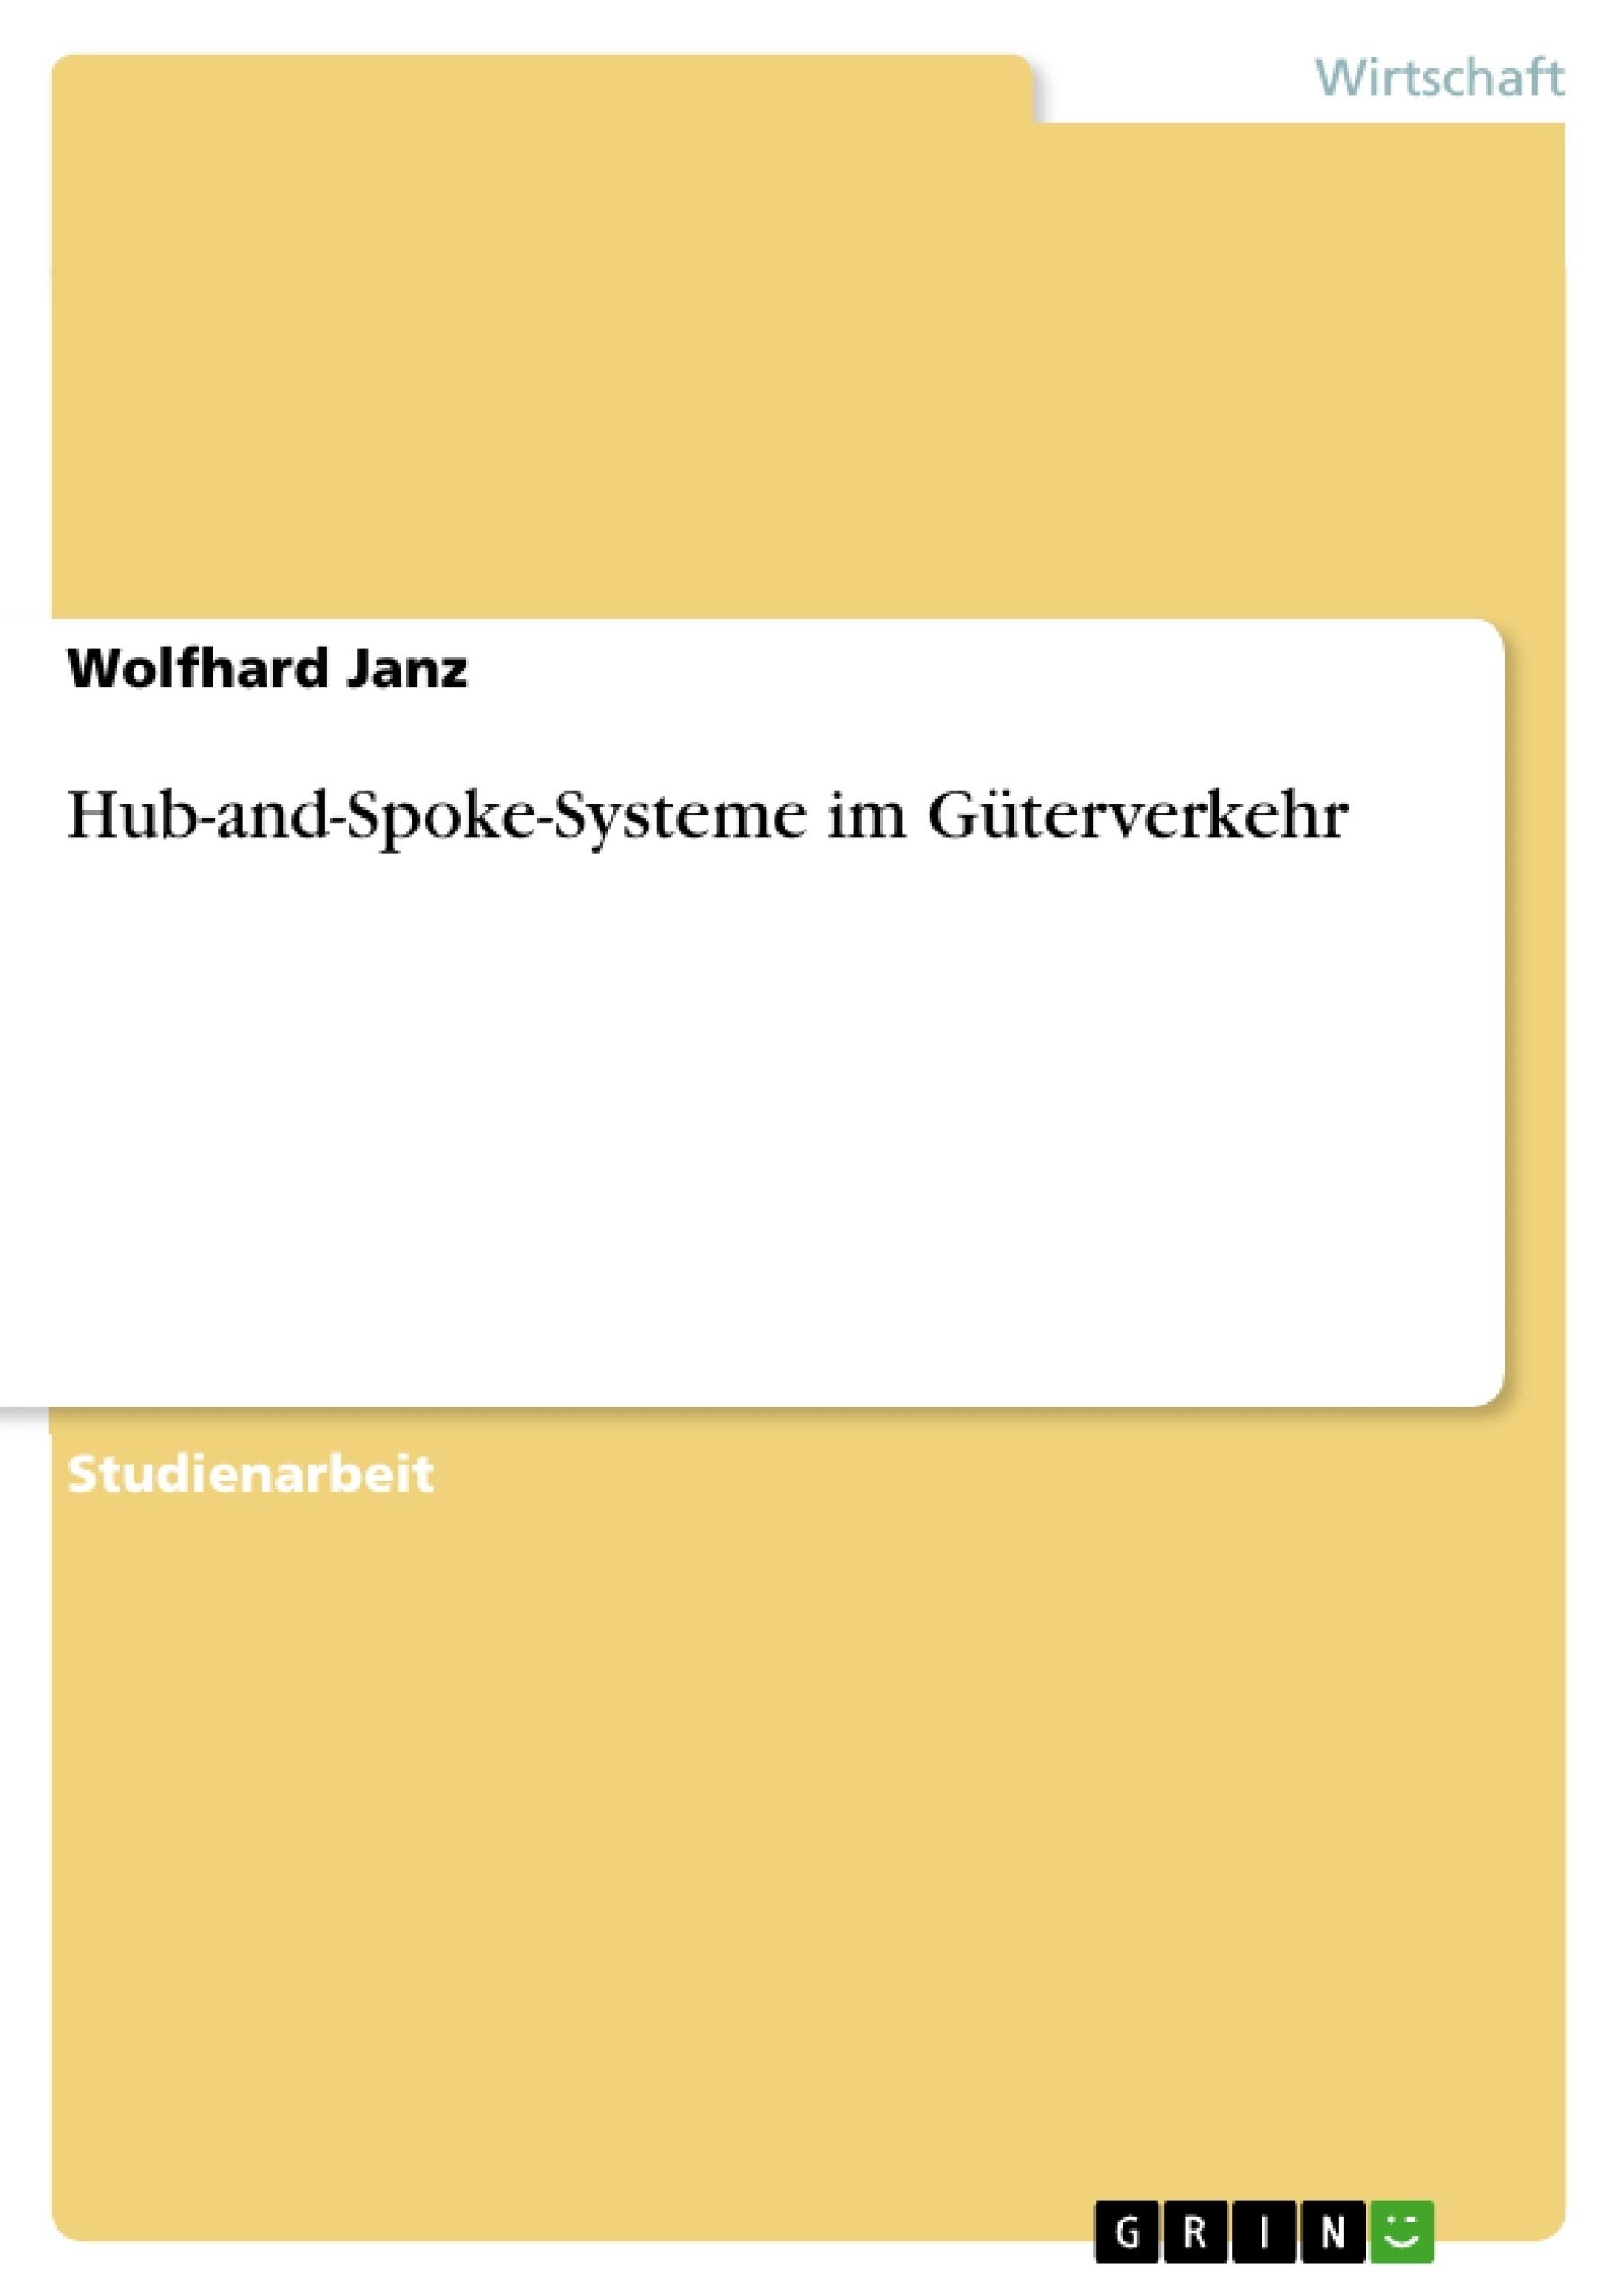 Titel: Hub-and-Spoke-Systeme im Güterverkehr